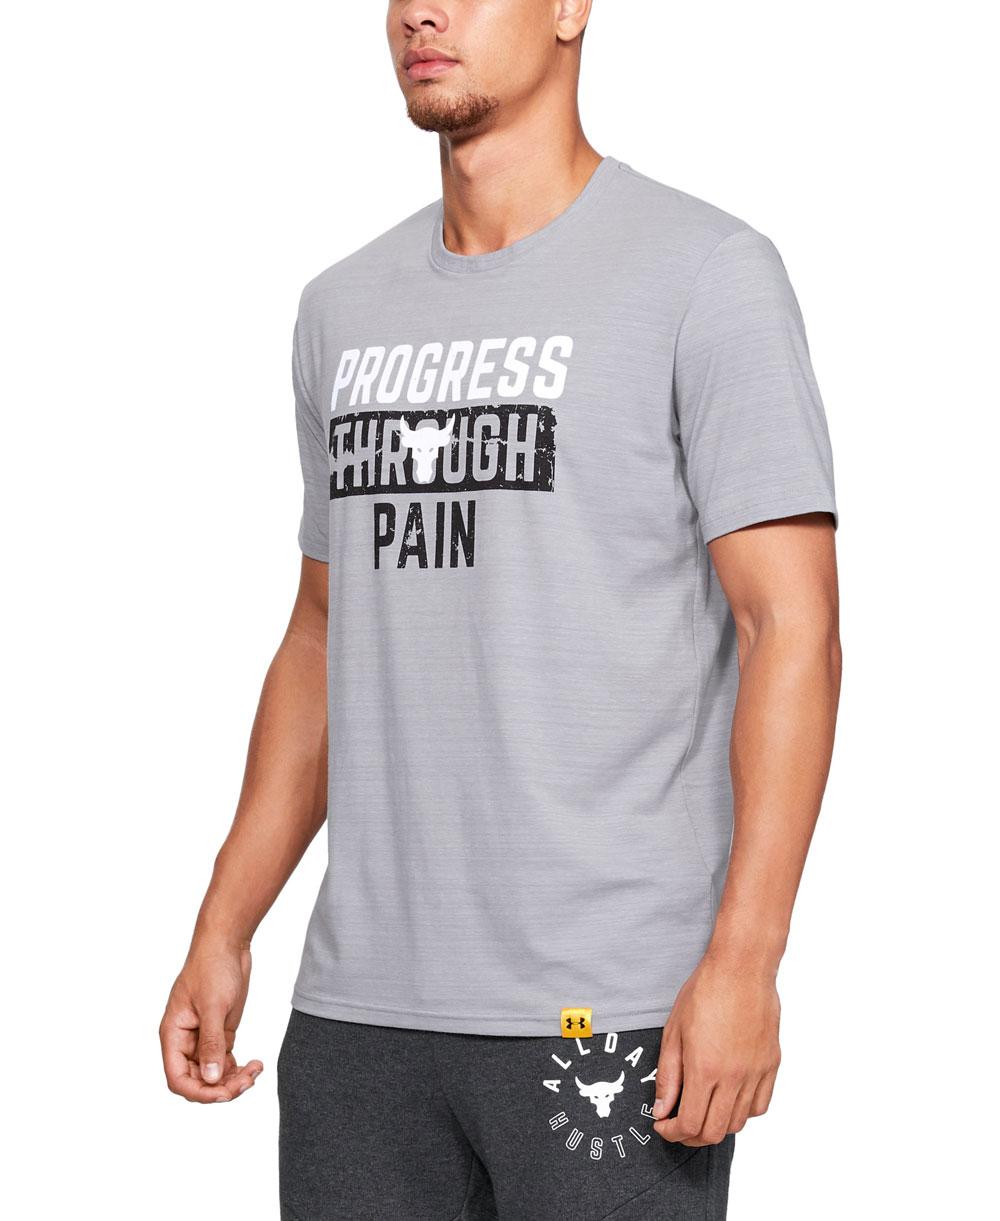 Project Rock Progress Through Pain Camiseta Manga Corta para Hombre Steel Light Heather